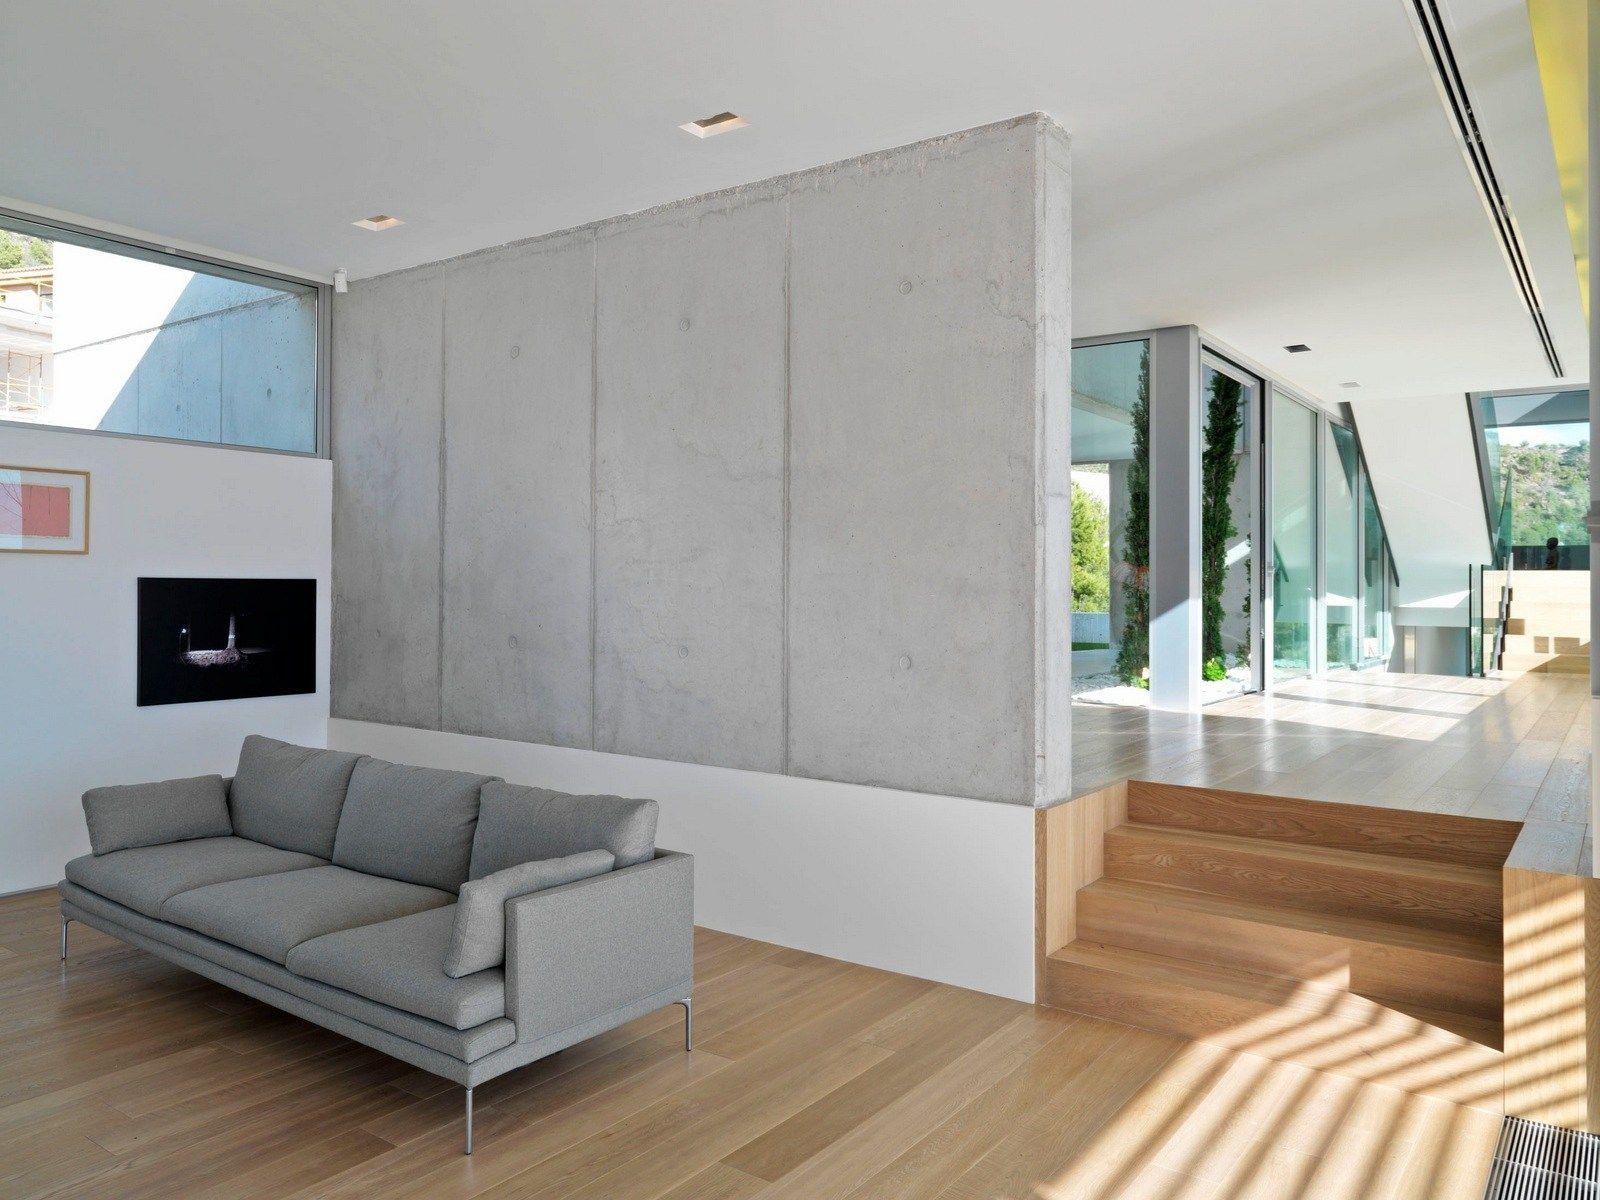 aluminium thermal break window nc s 120 sth linea slim by metra